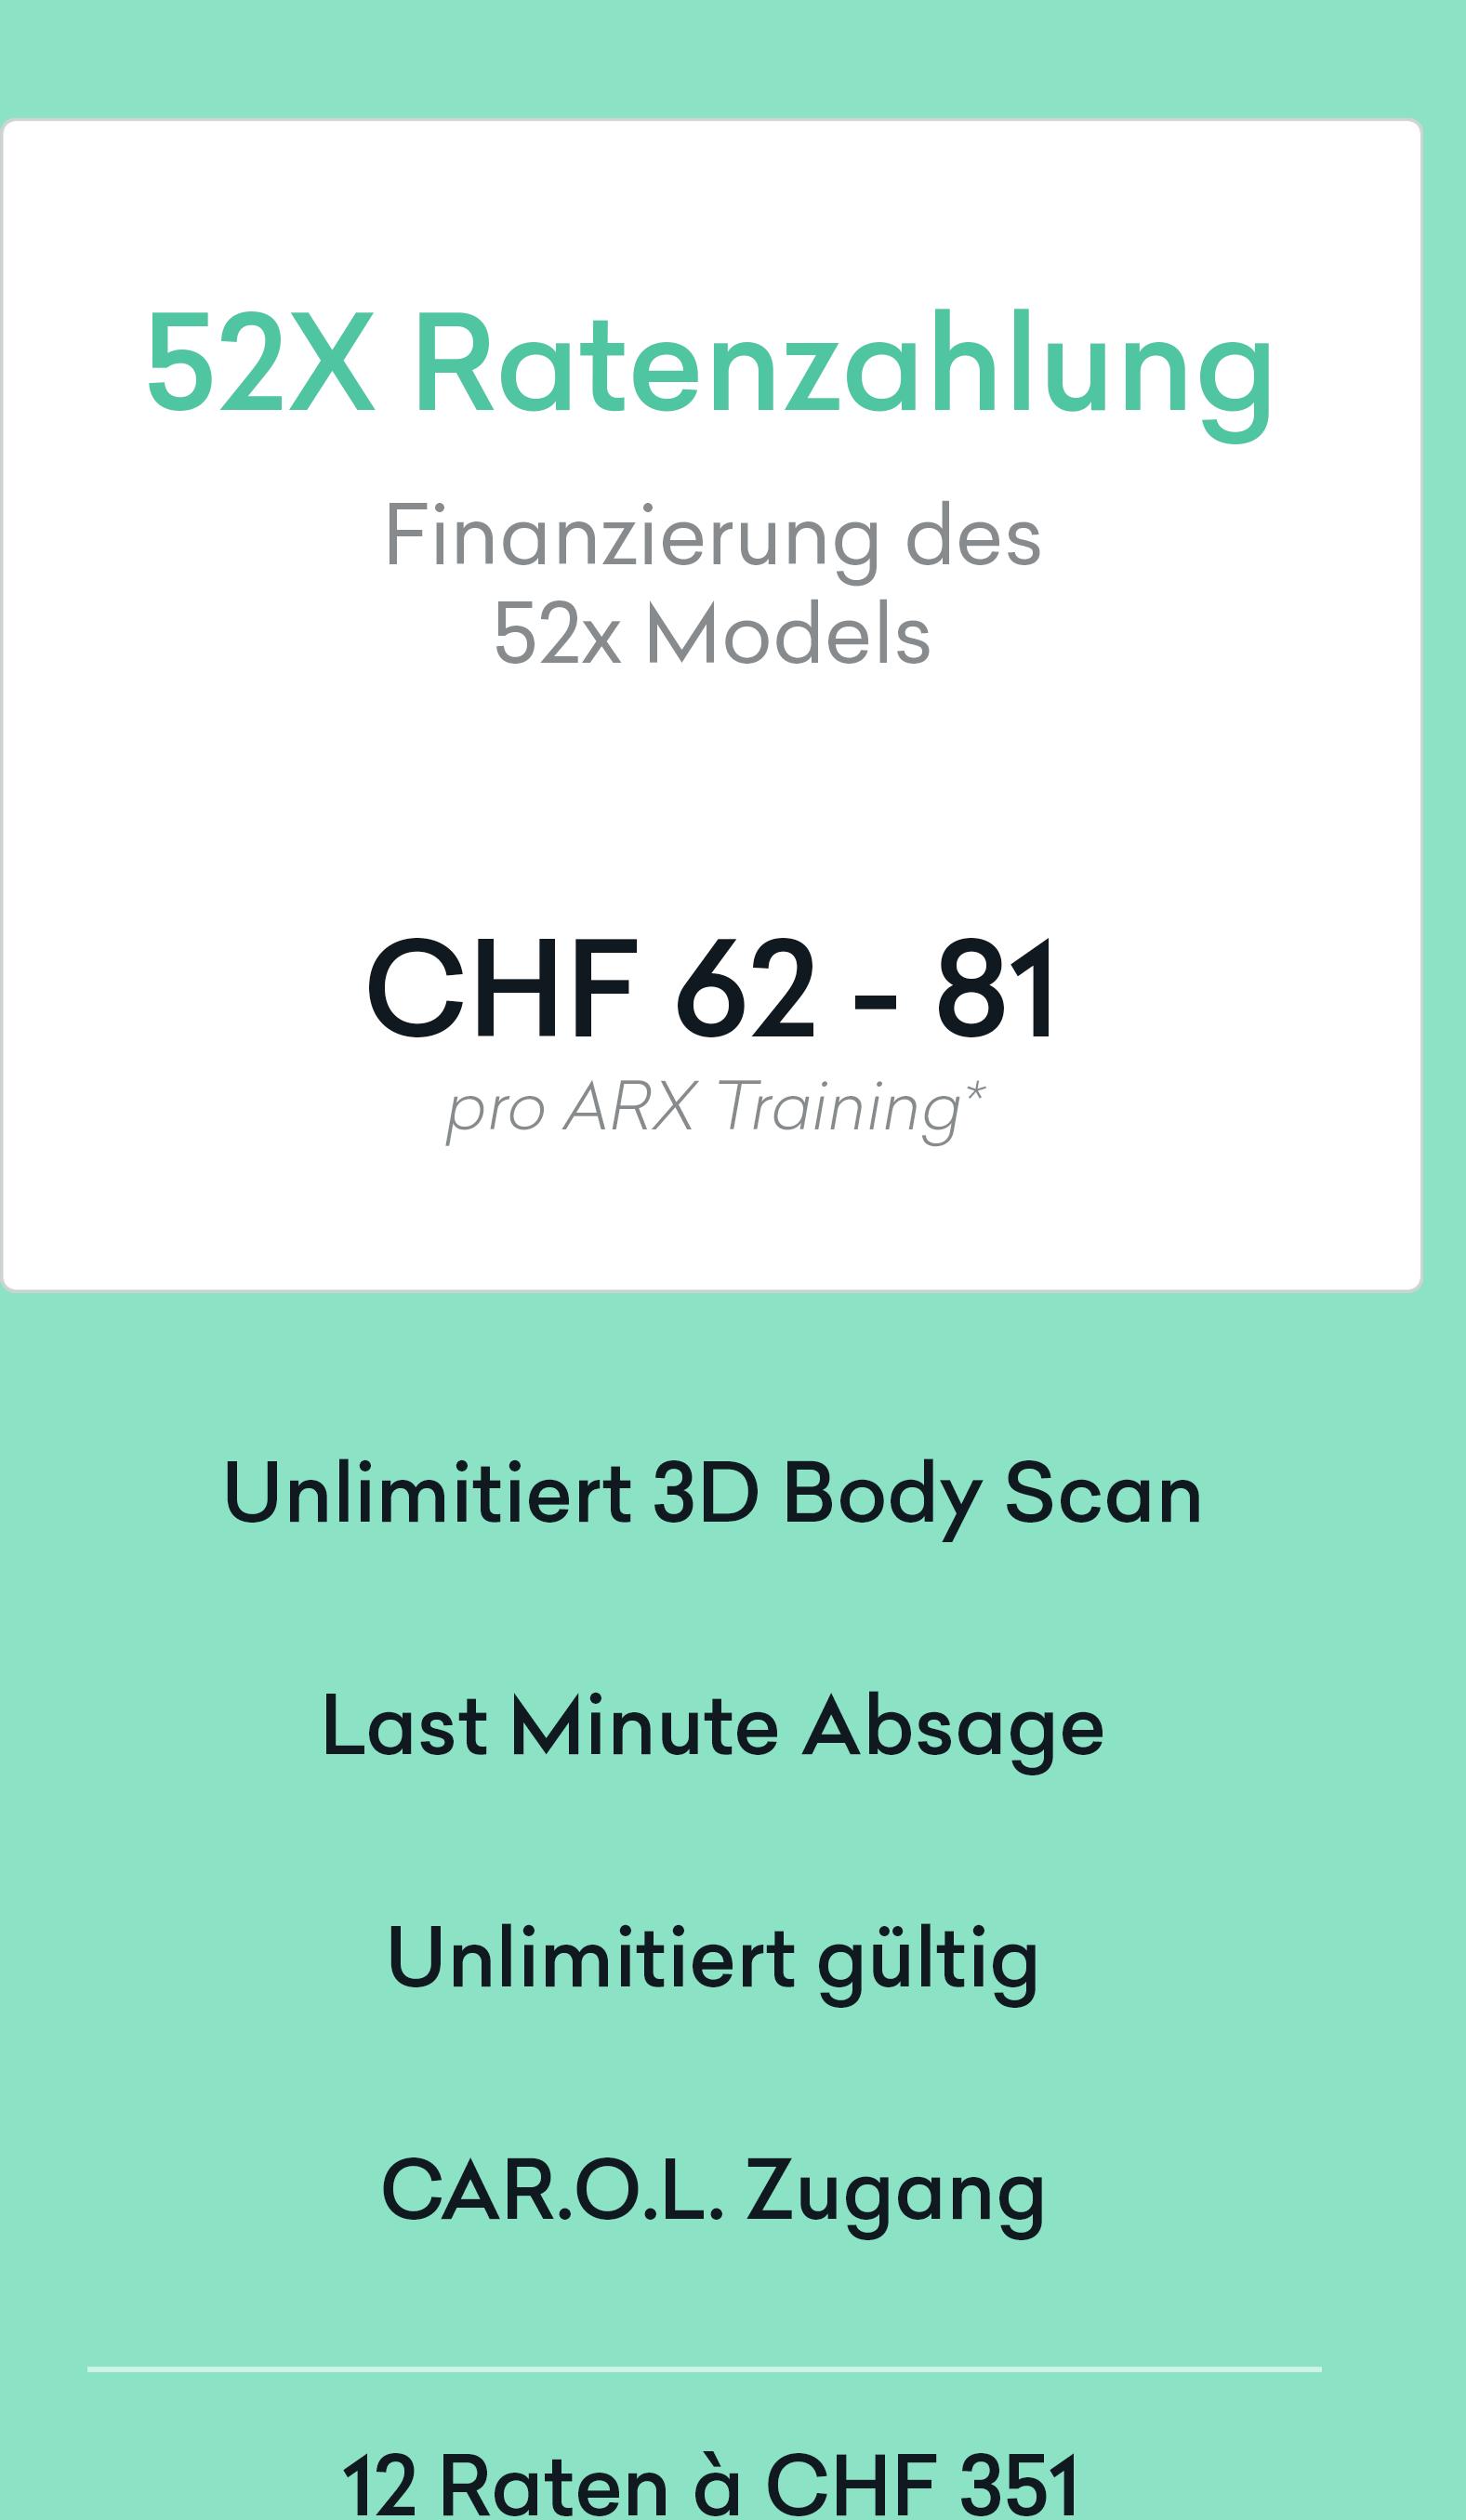 52er Paket - Ratenzahlung